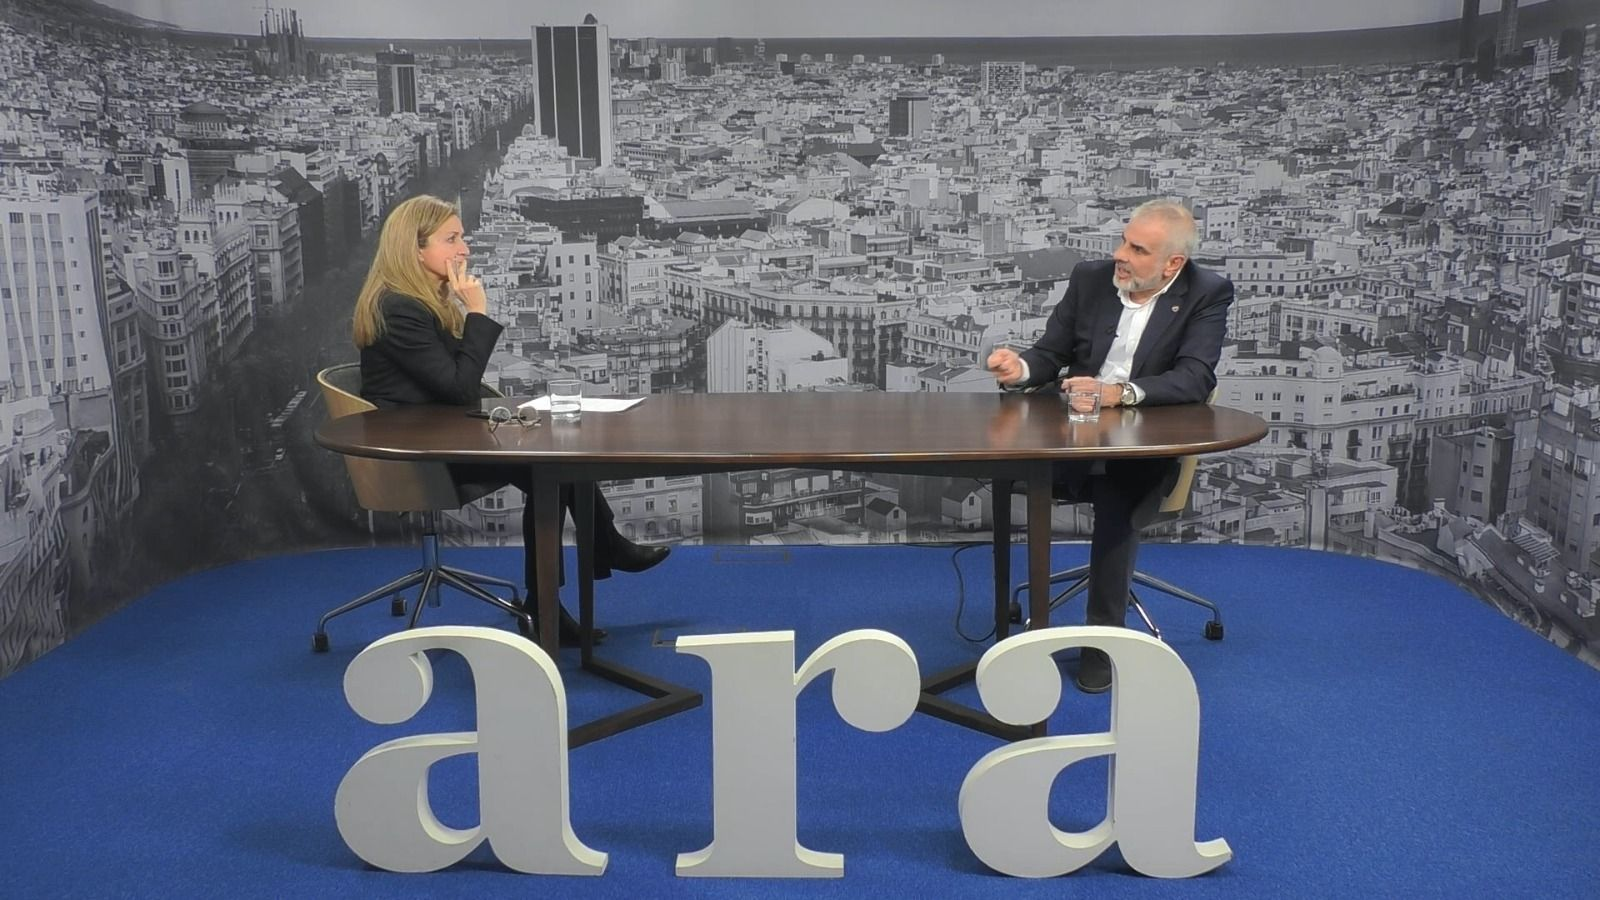 Entrevista d'Esther Vera a Carlos Carrizosa